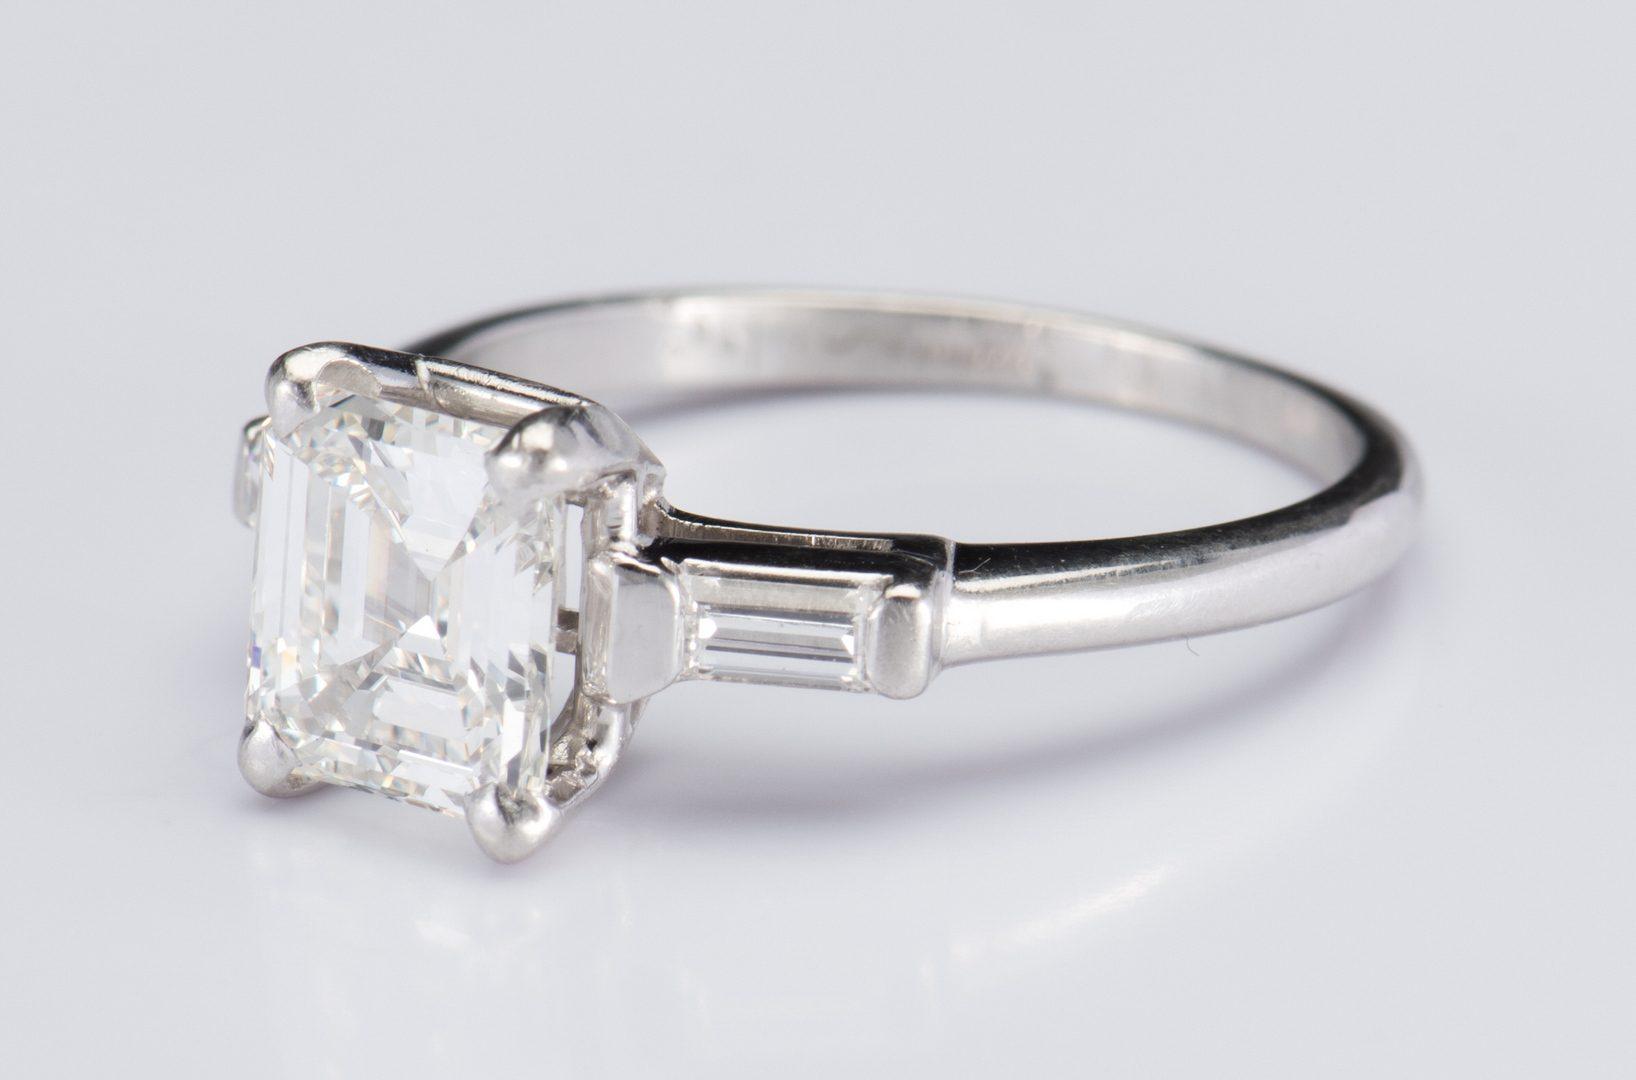 Lot 48: Plat 1.56 ct. Emerald Cut Diamond Ring